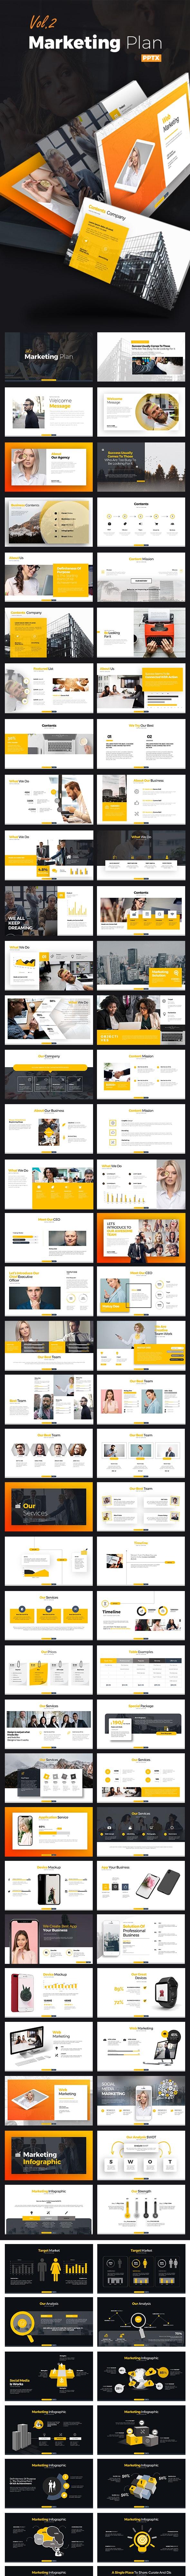 Marketing Plan Vol.2 - Pitch Deck PowerPoint Templates